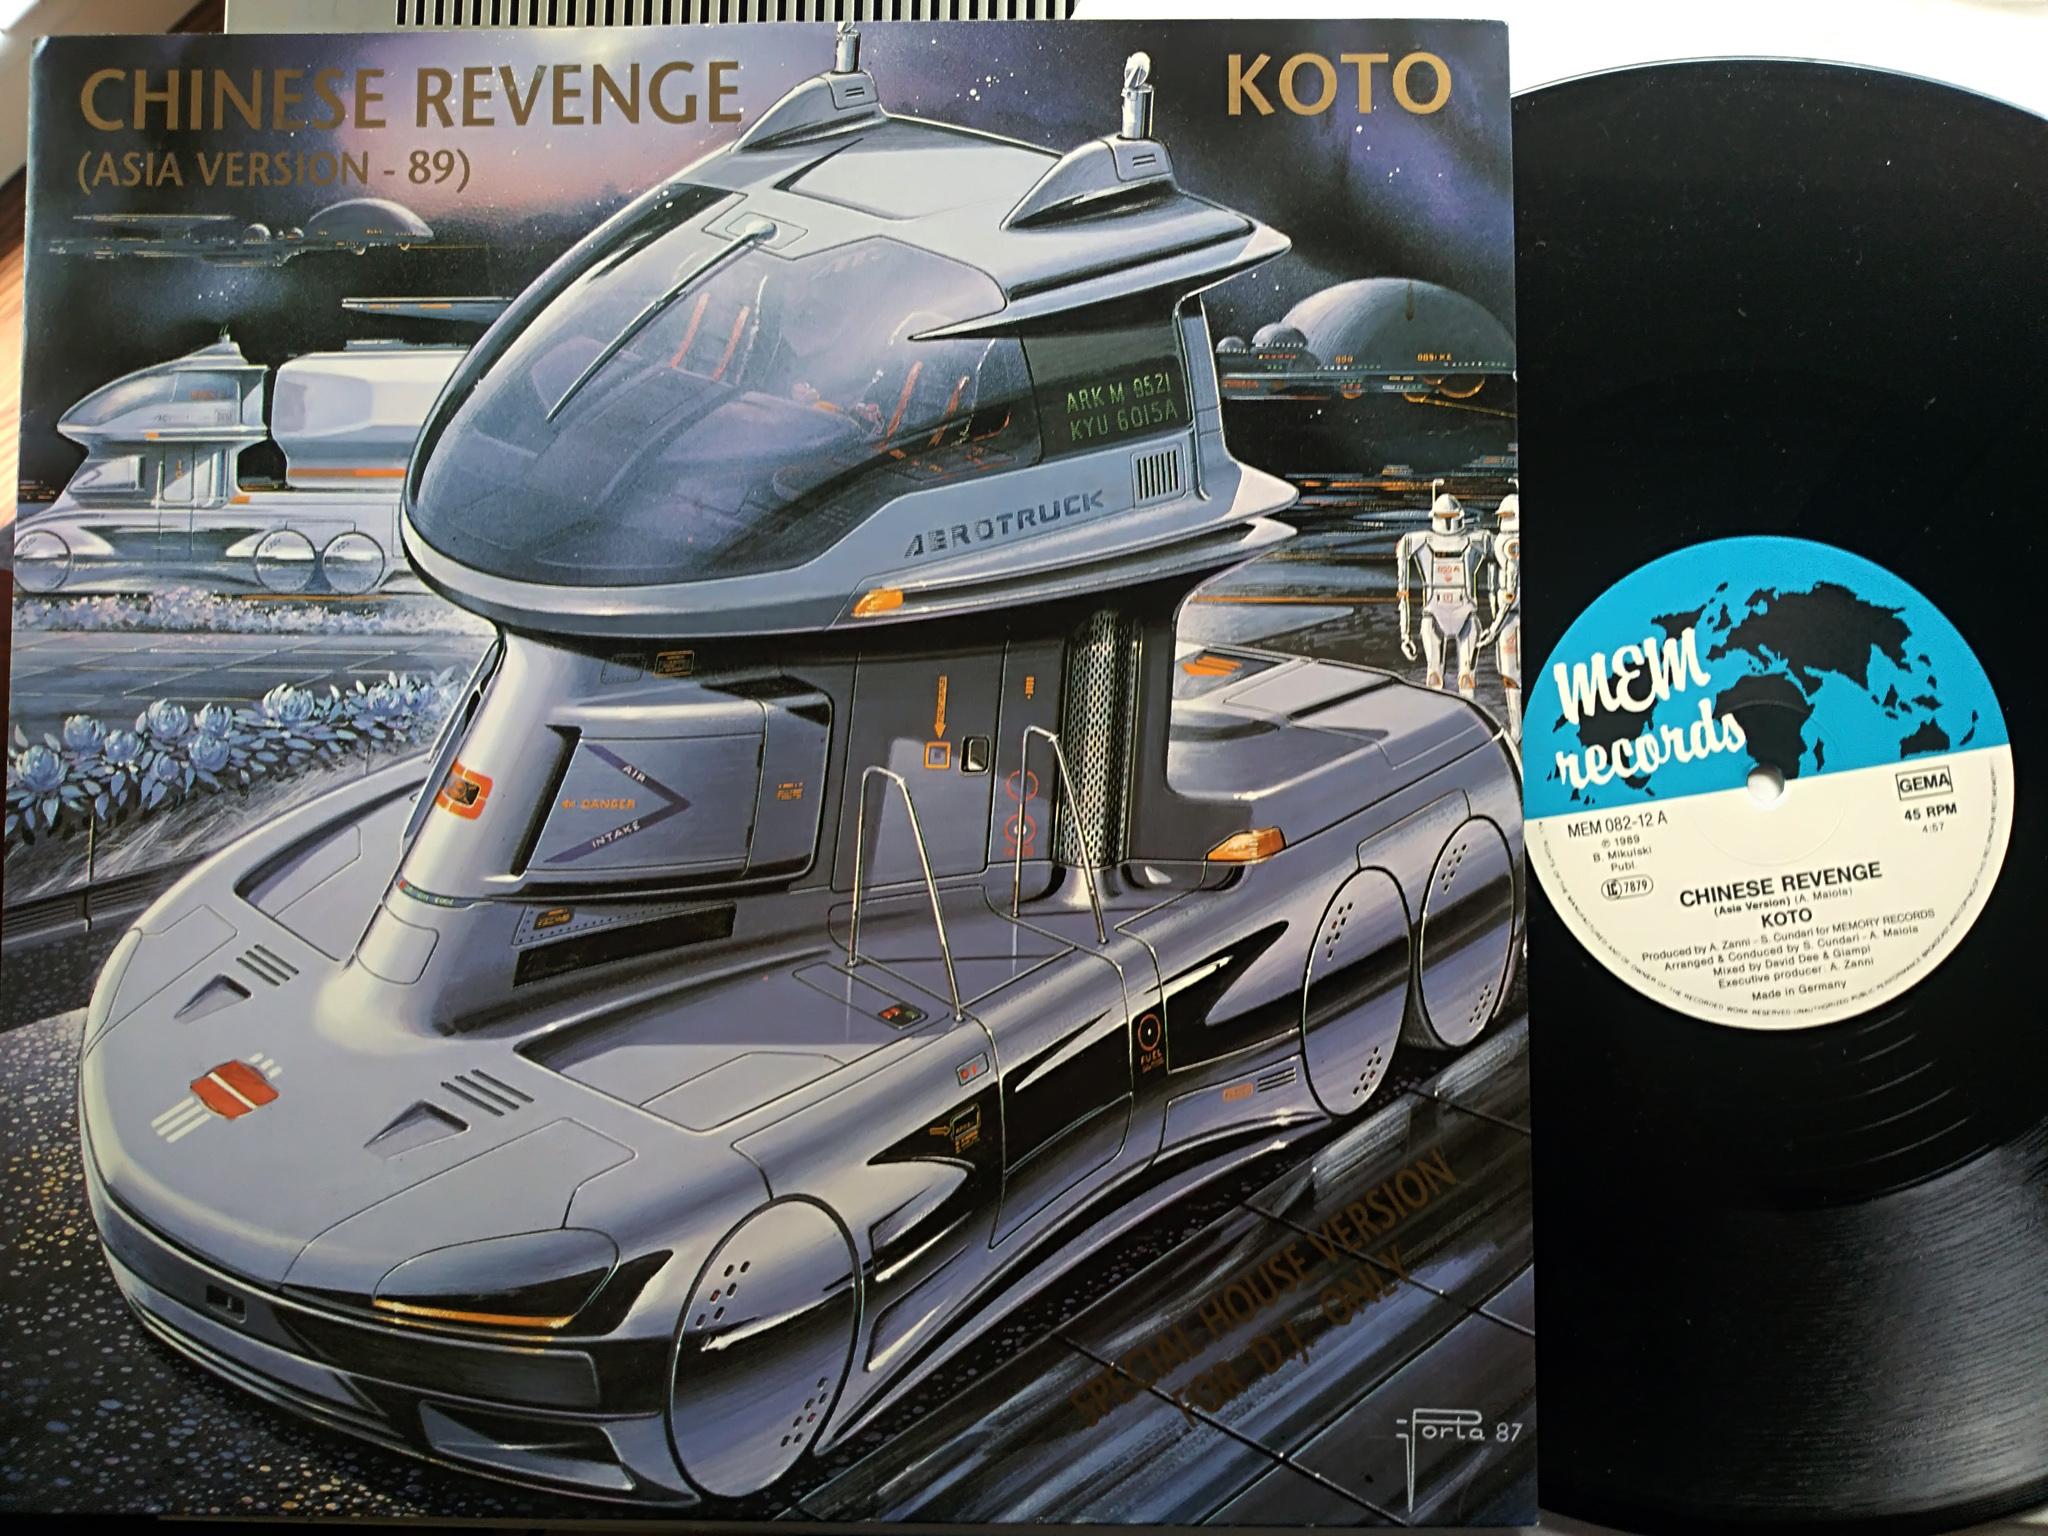 Koto - Chinese Revenge (Asia Version 89)